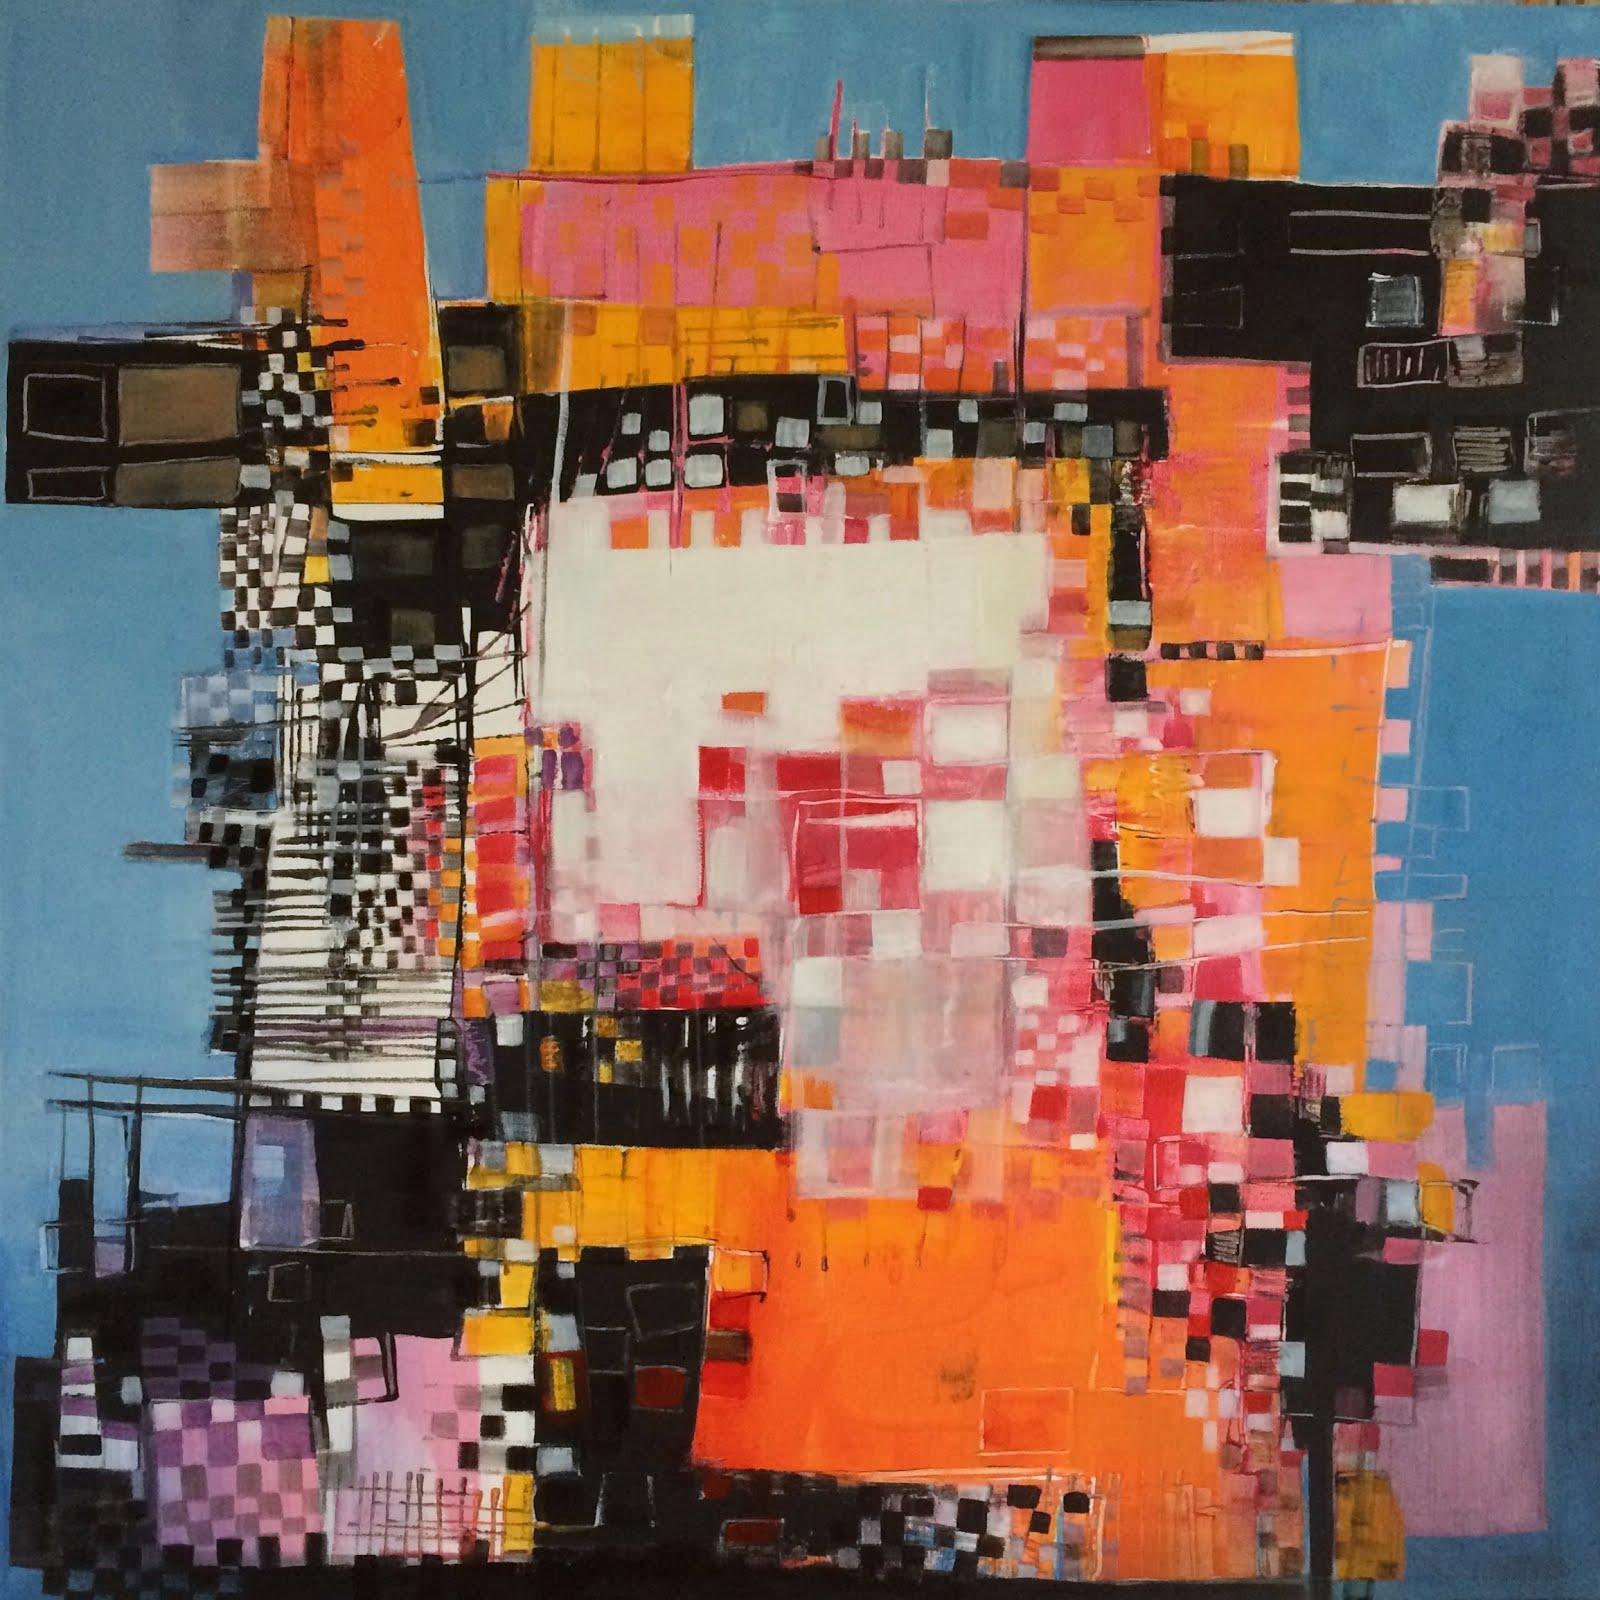 Improbable Babel - 80 x 80 cm - 2017